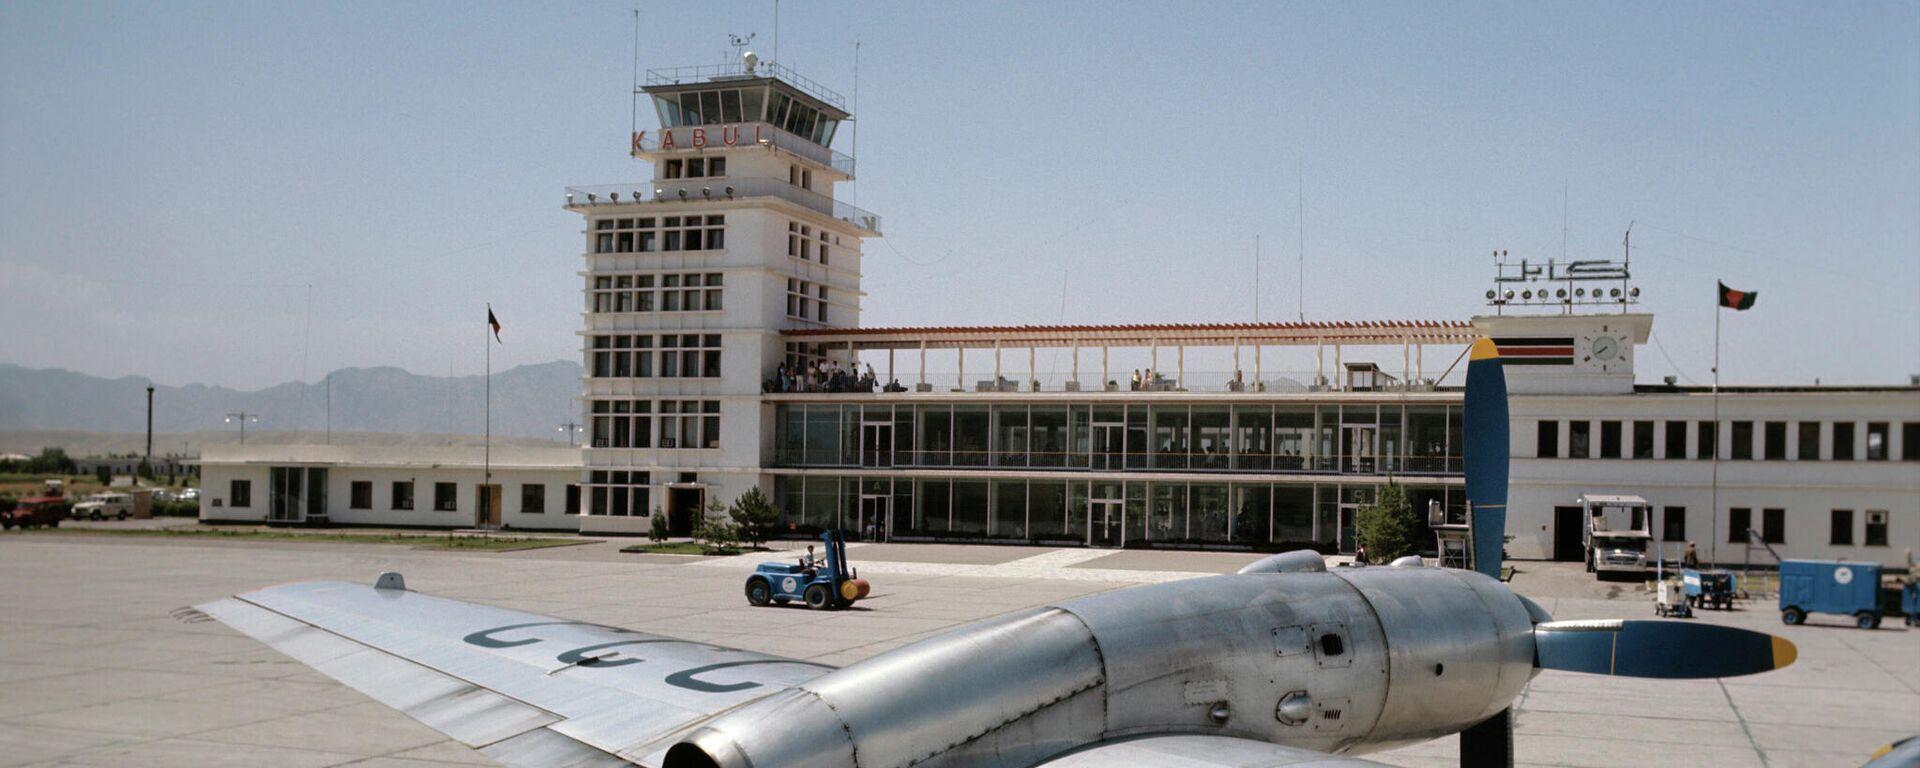 Международный аэропорт Кабул - Sputnik Таджикистан, 1920, 15.07.2021